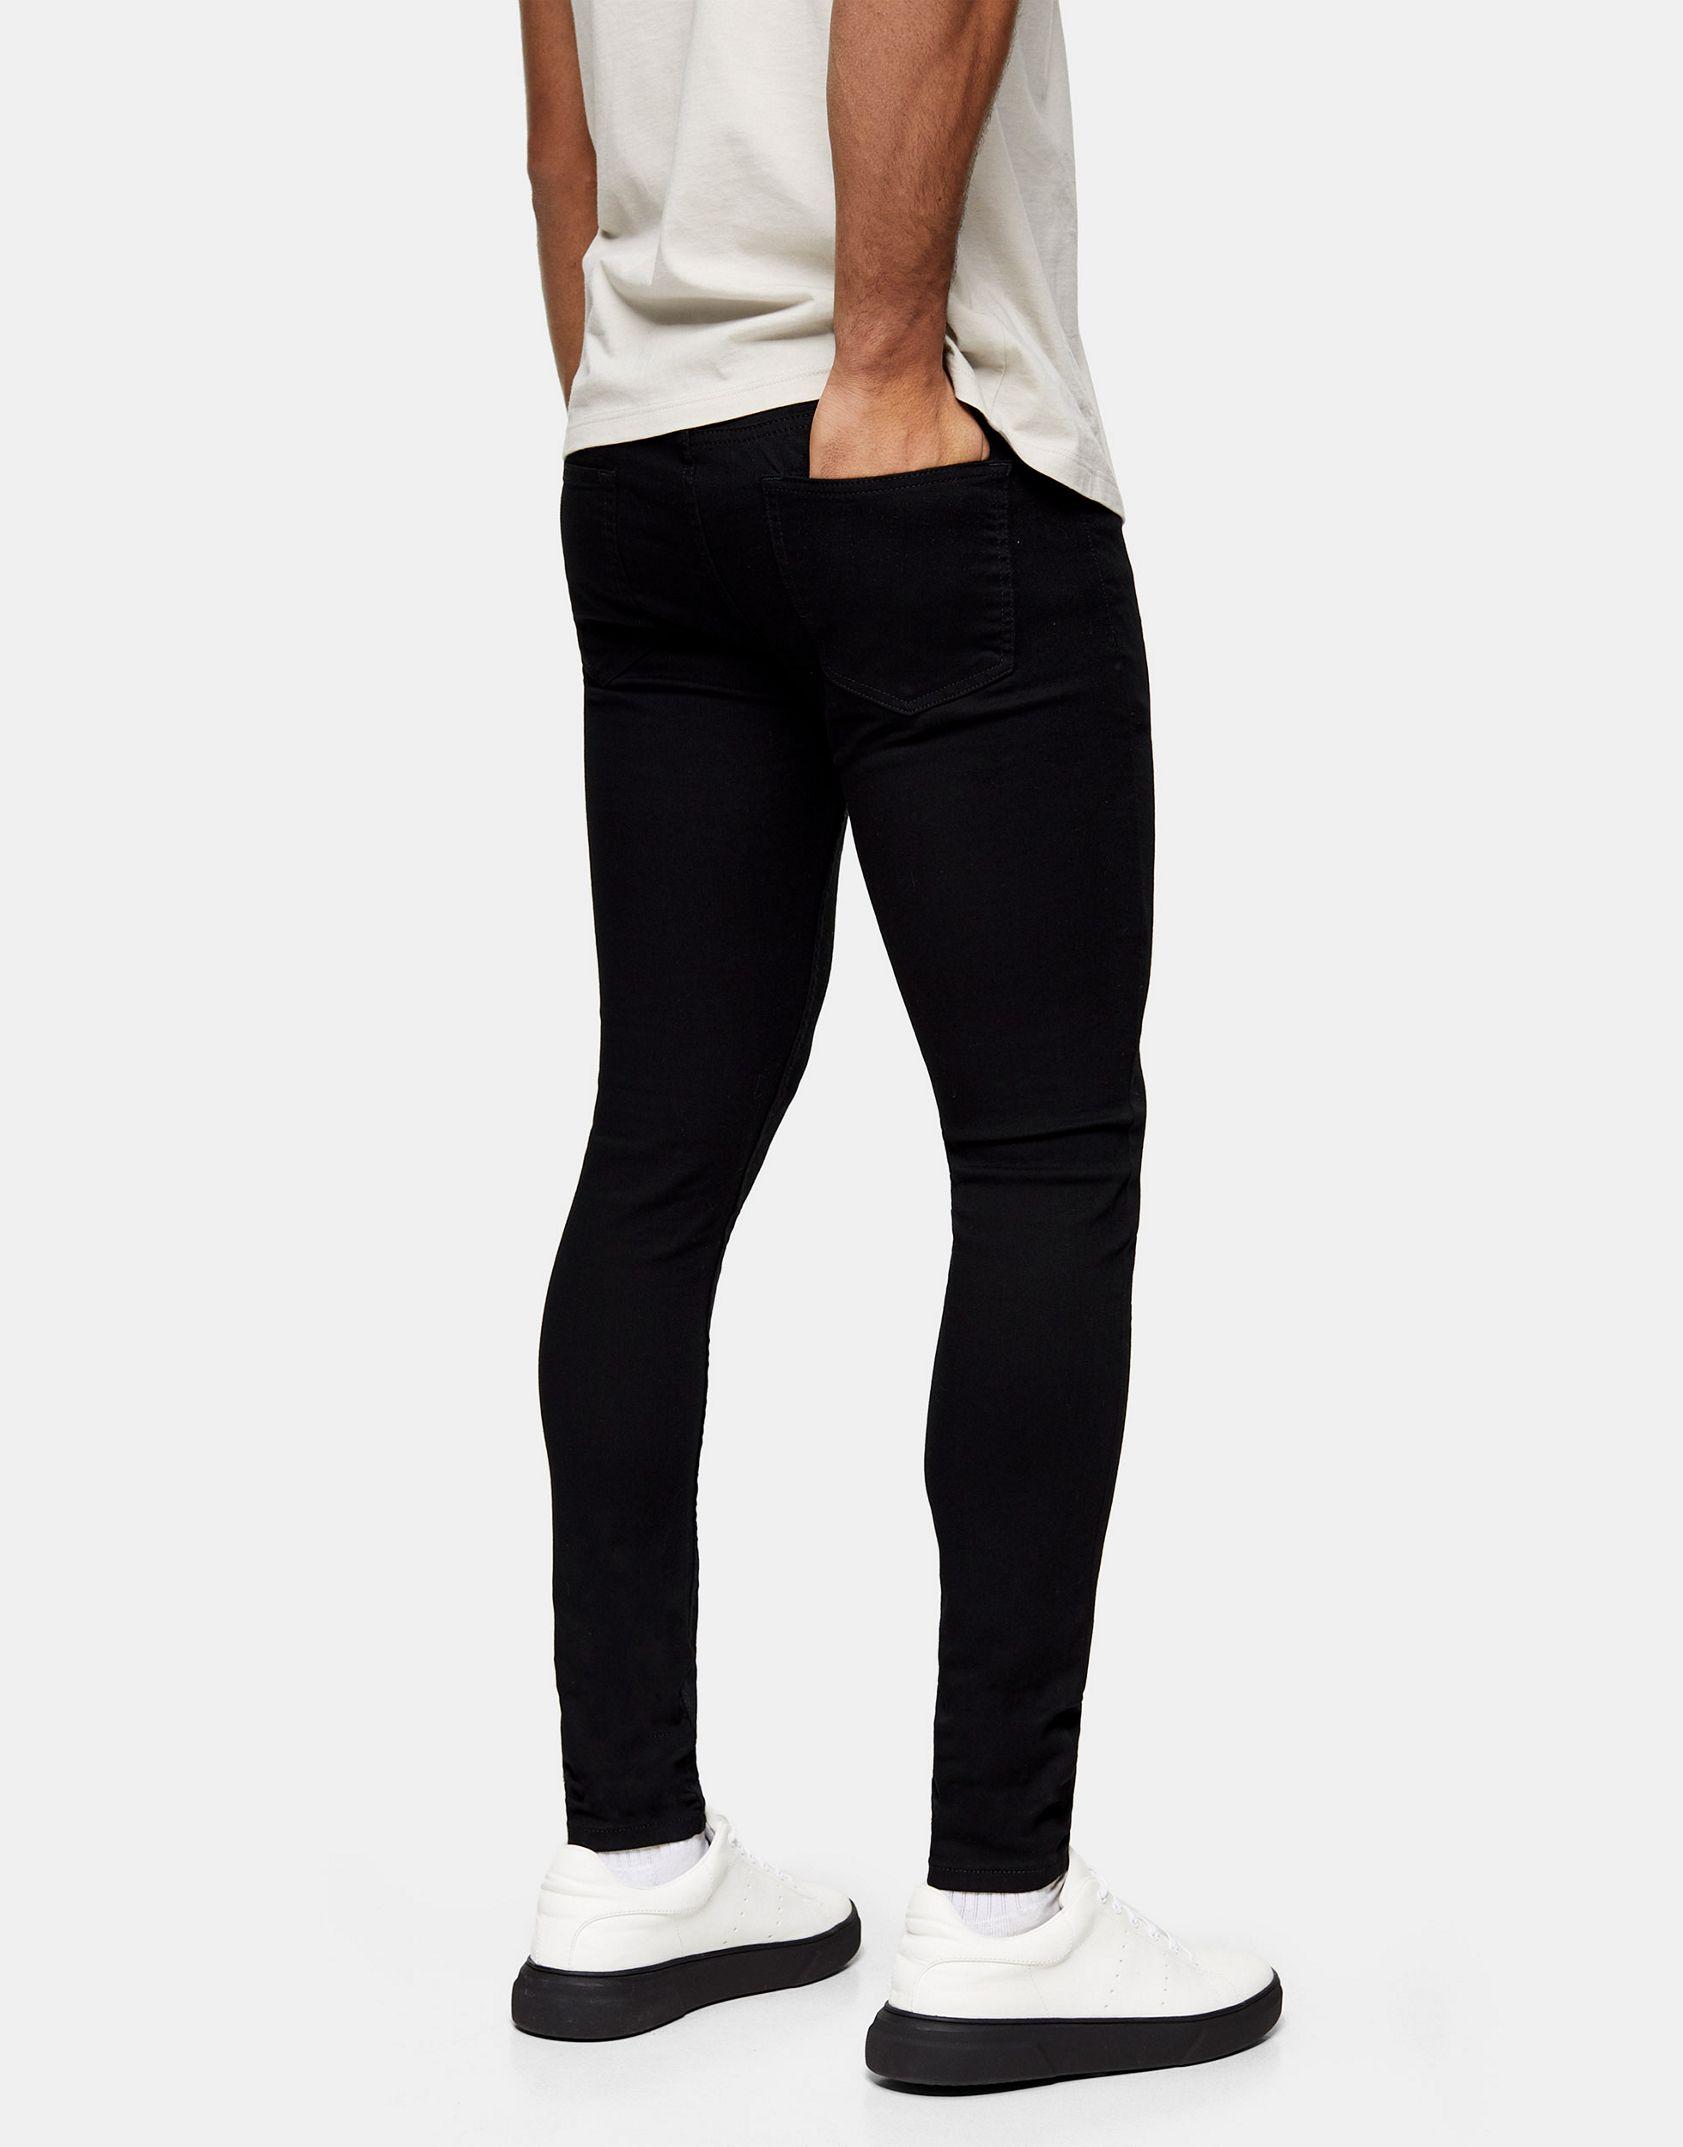 Topman organic cotton blend spray on jeans in black -  Price Checker